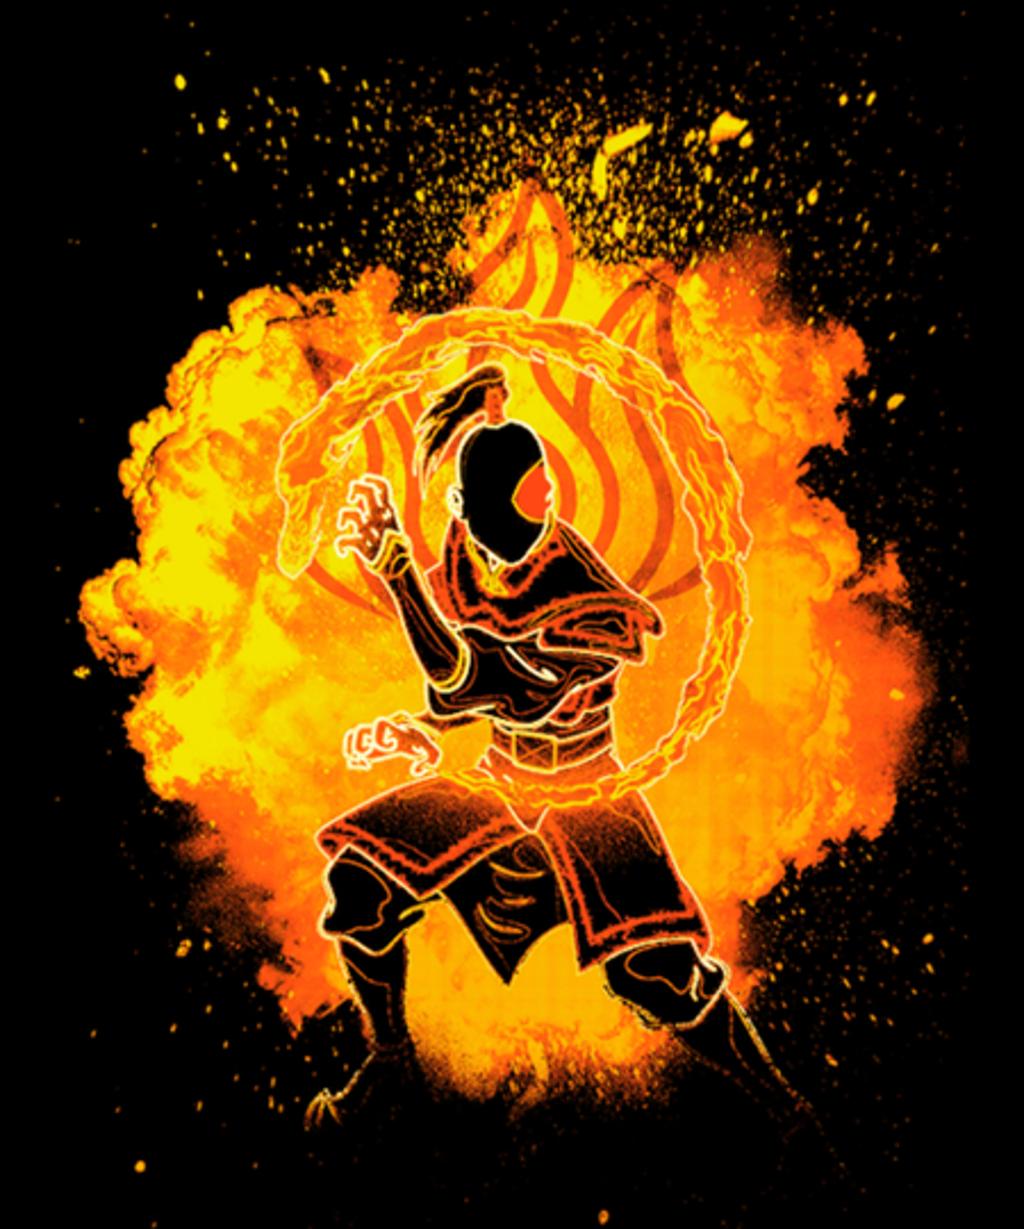 Qwertee: Soul of the firebender